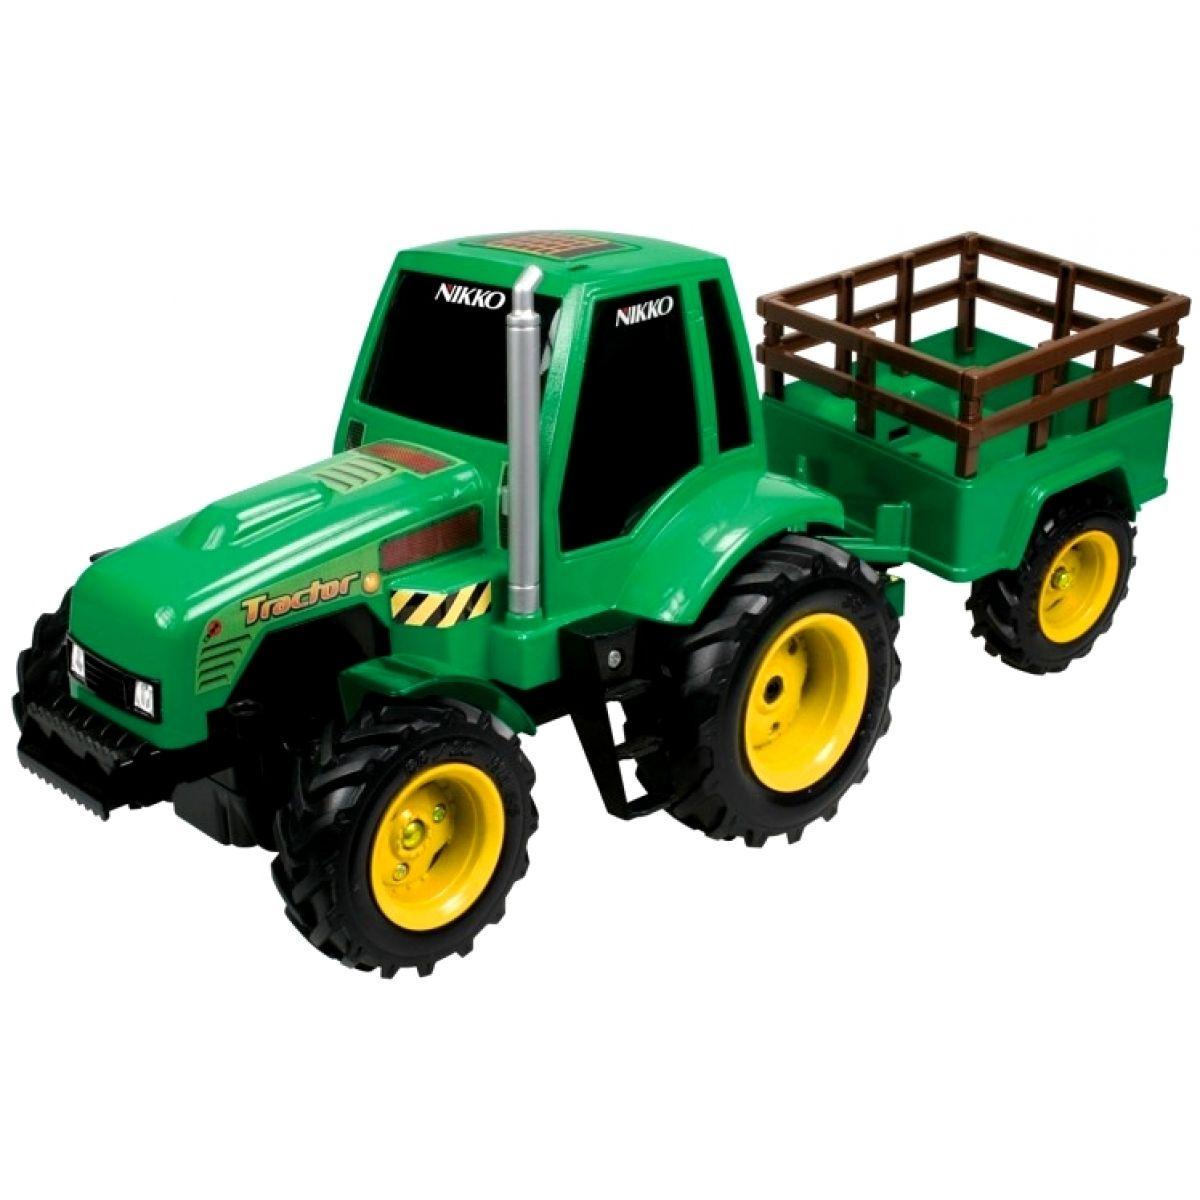 Nikko RC Traktor s valníkem